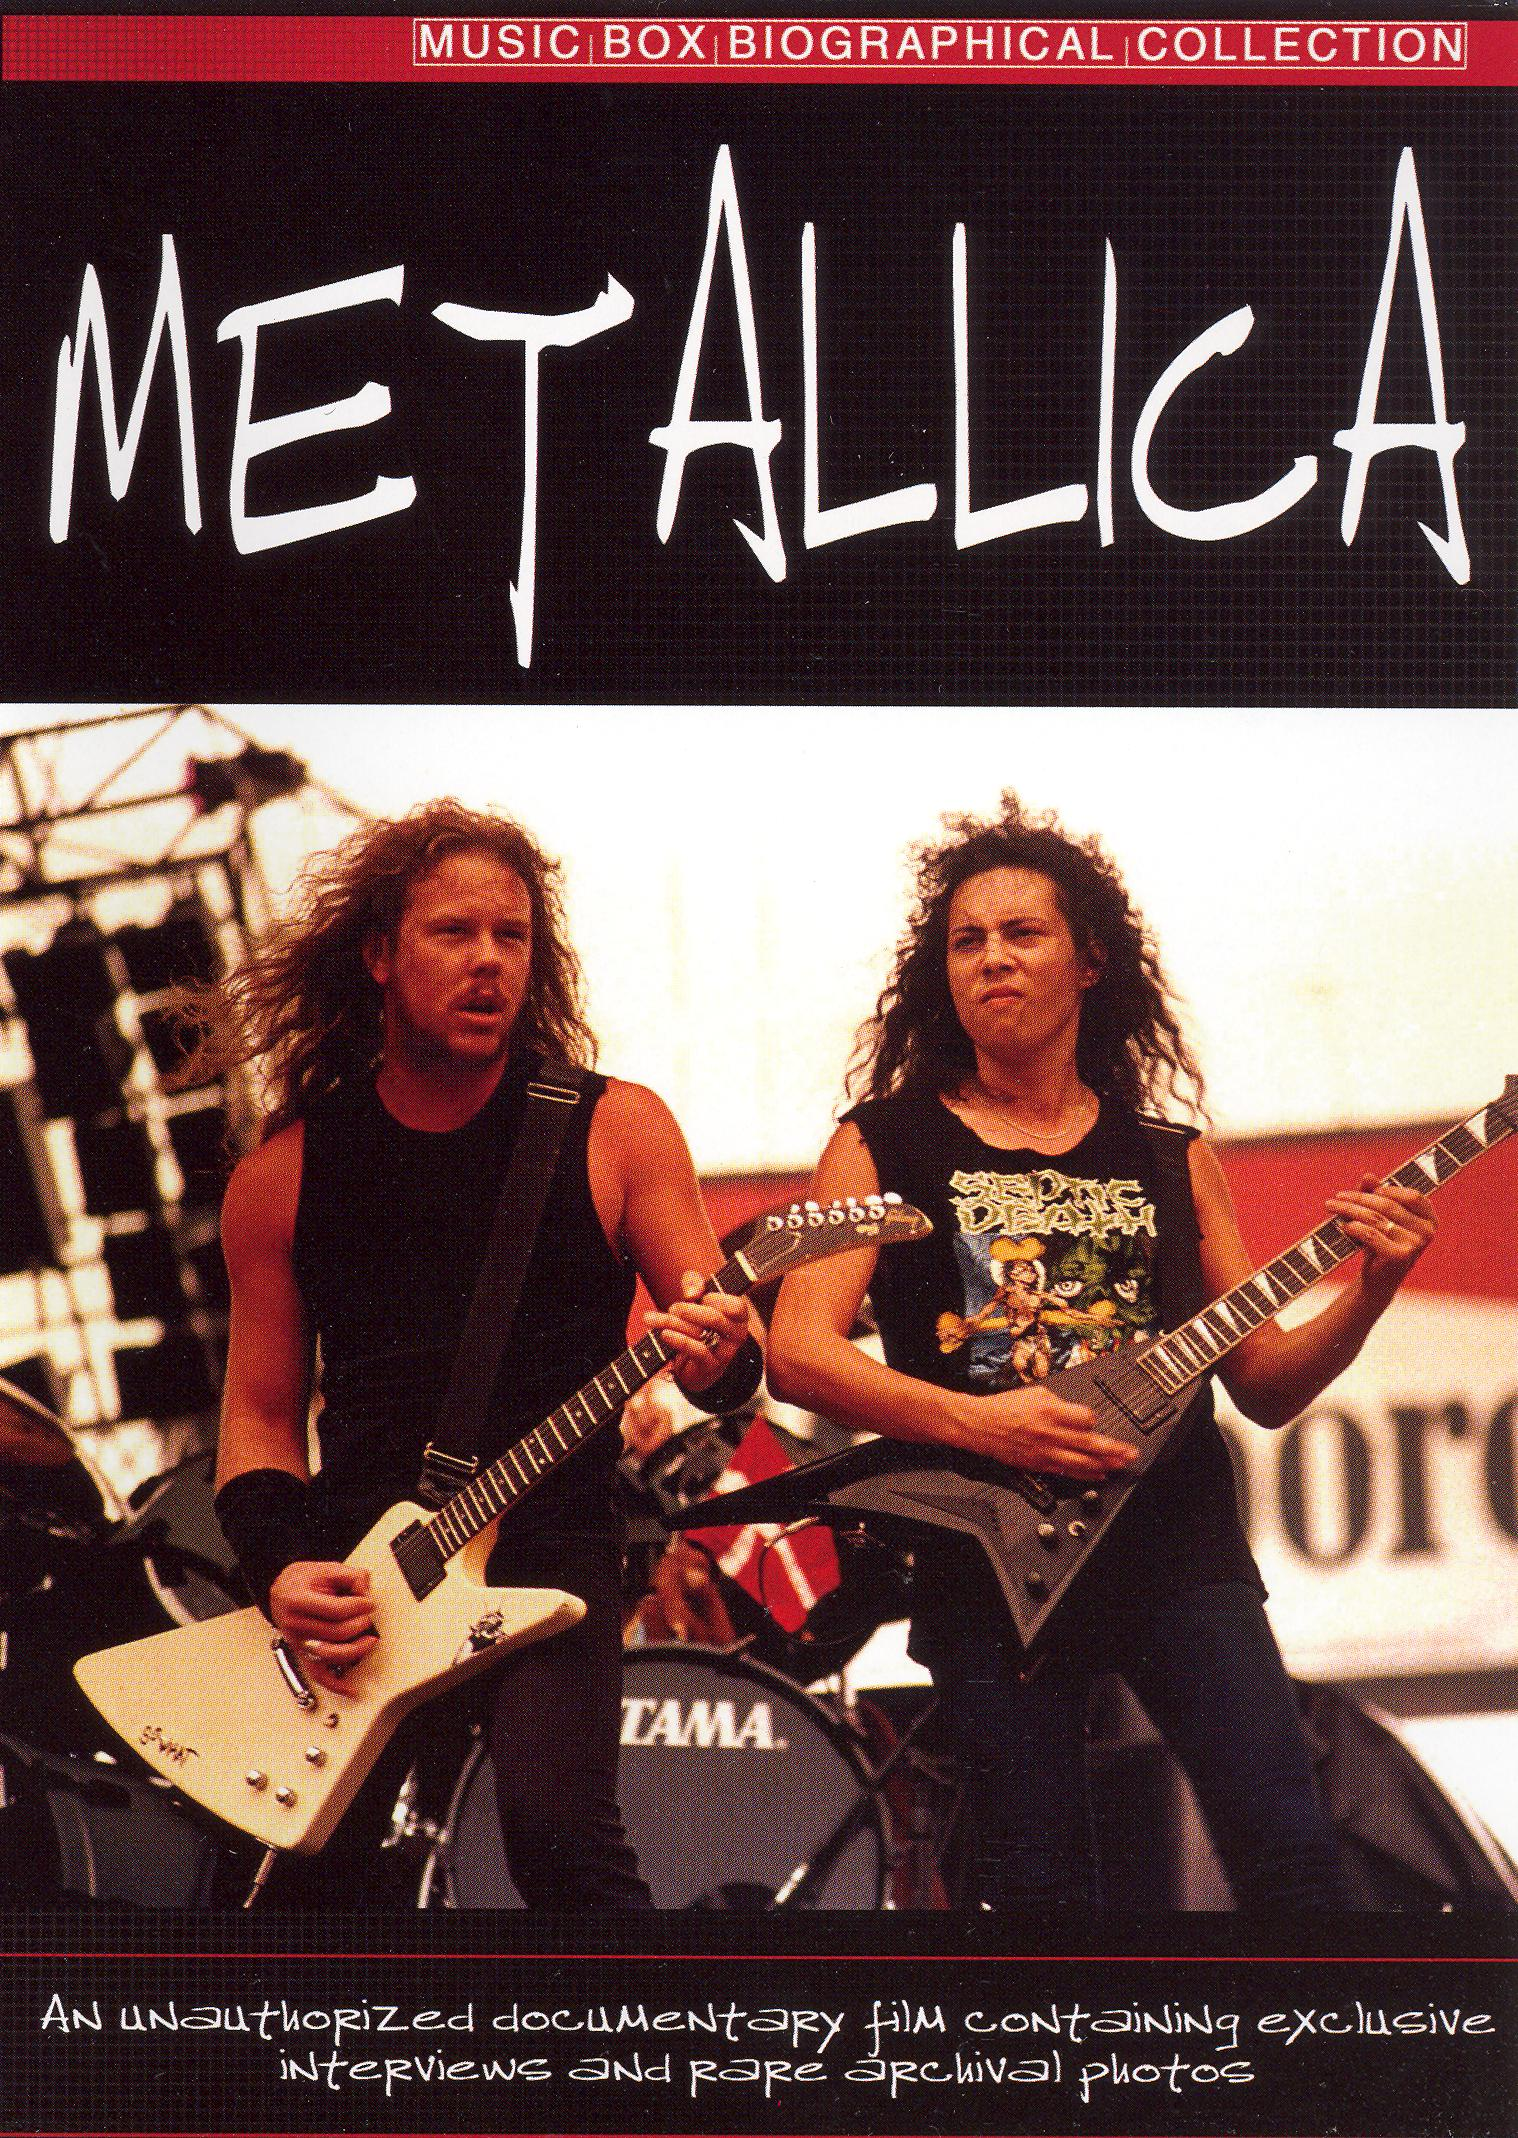 Music Box Biographical Collection: Metallica